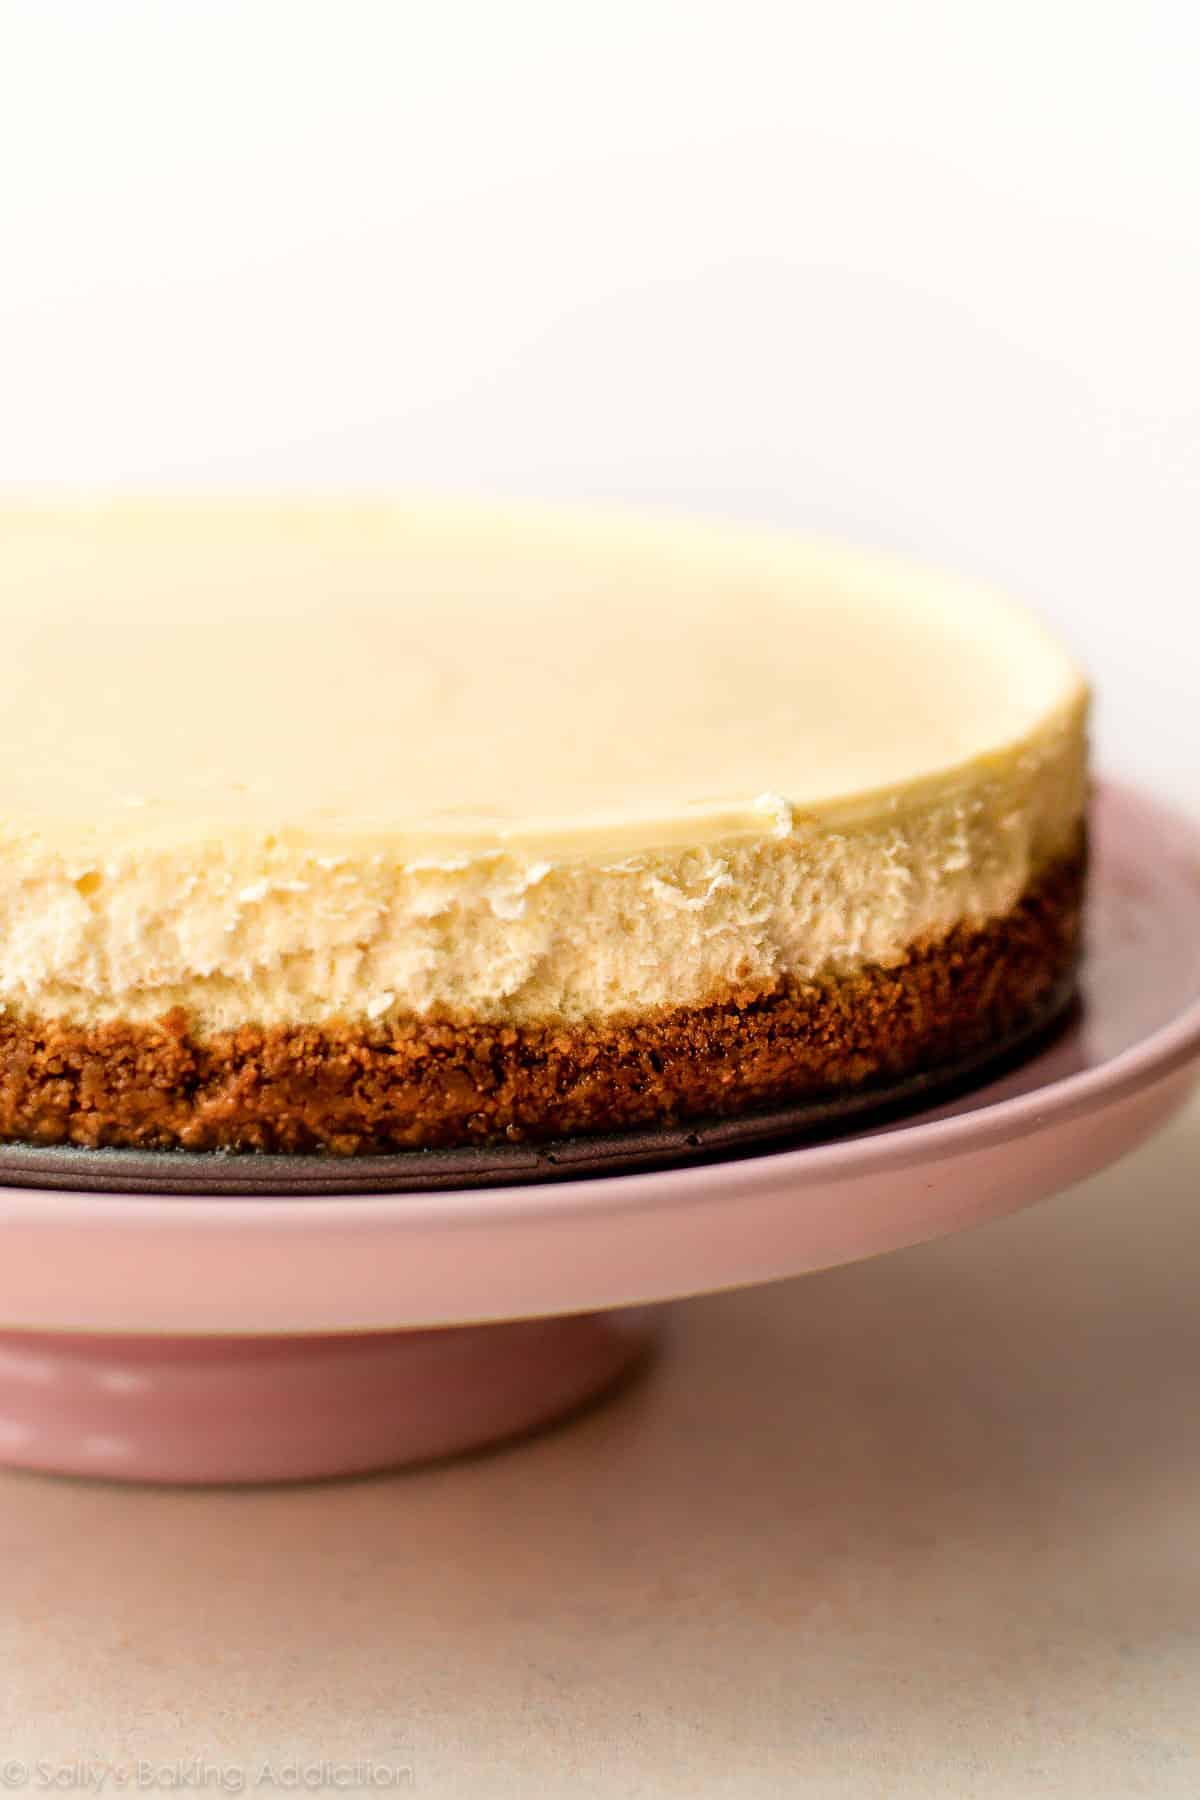 Classic Cheesecake Recipe | Sally's Baking Addiction